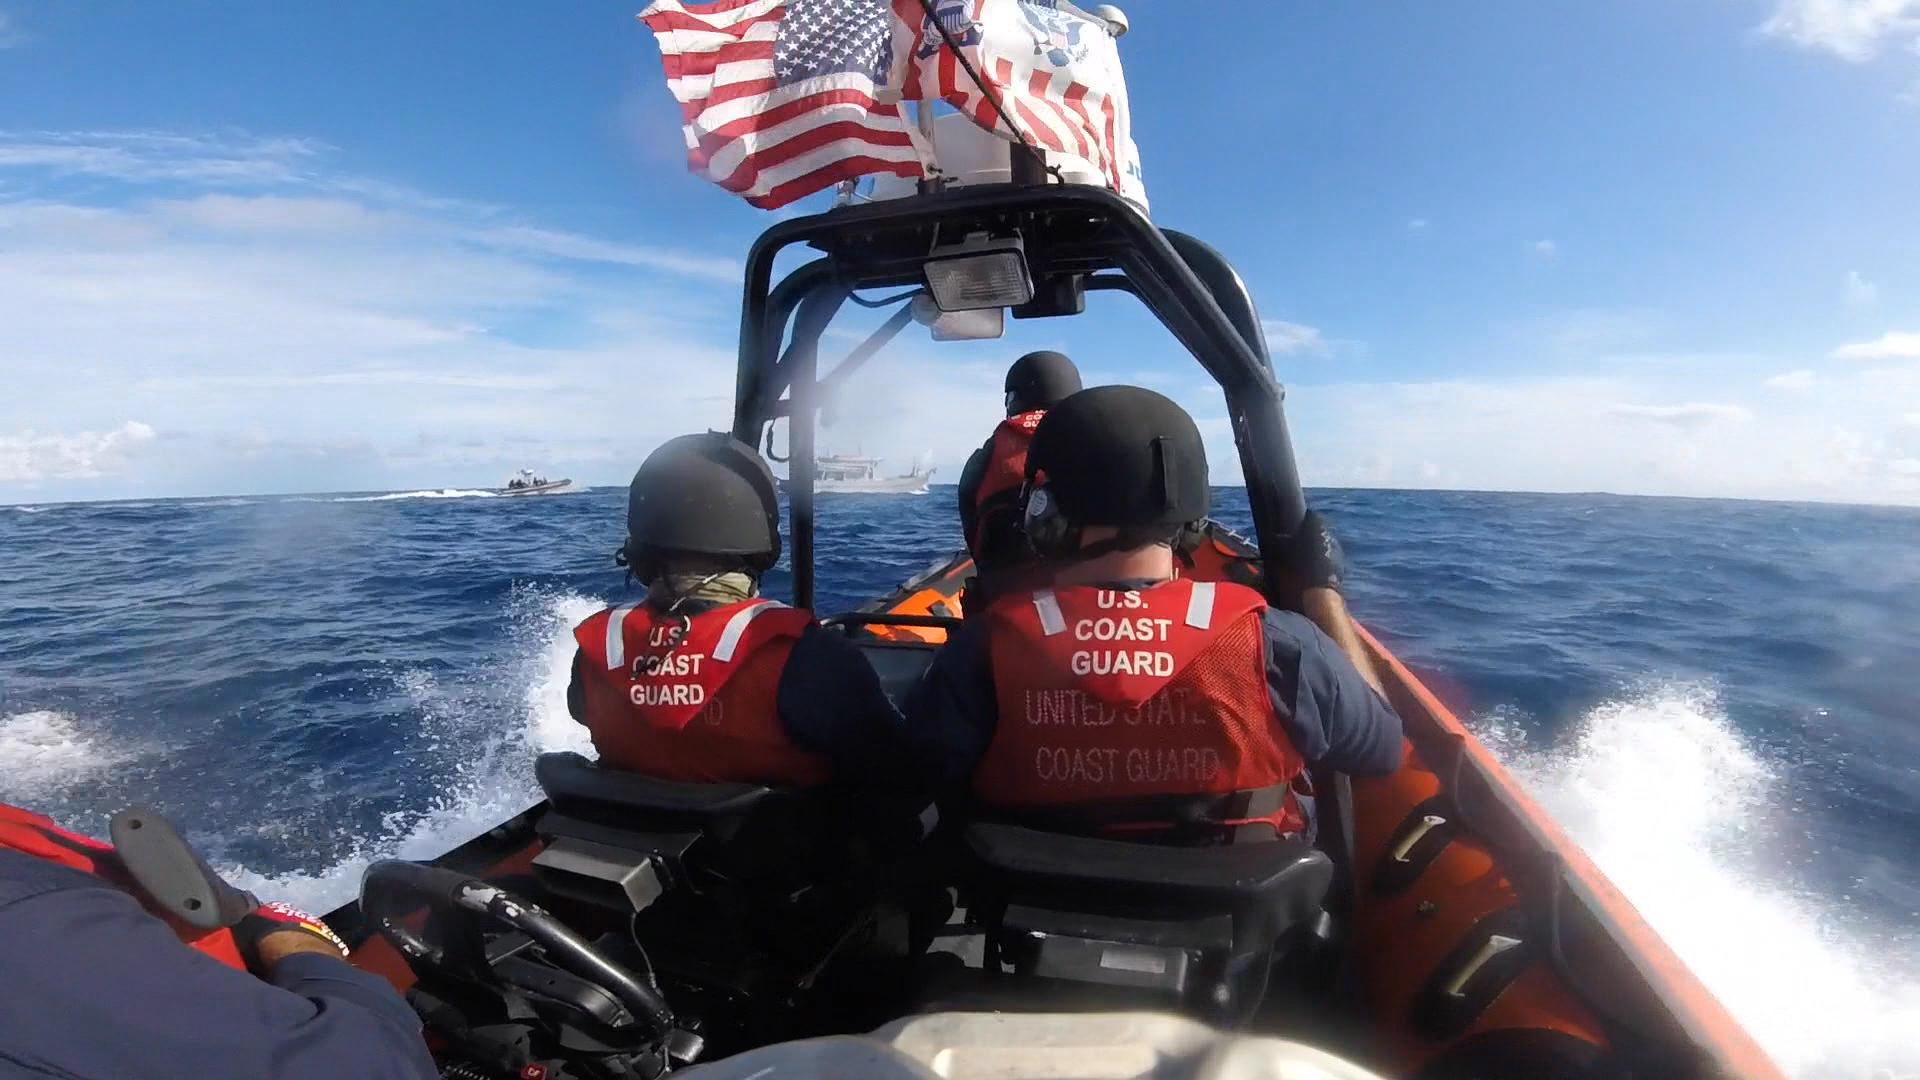 Coast Guard Valiant Video